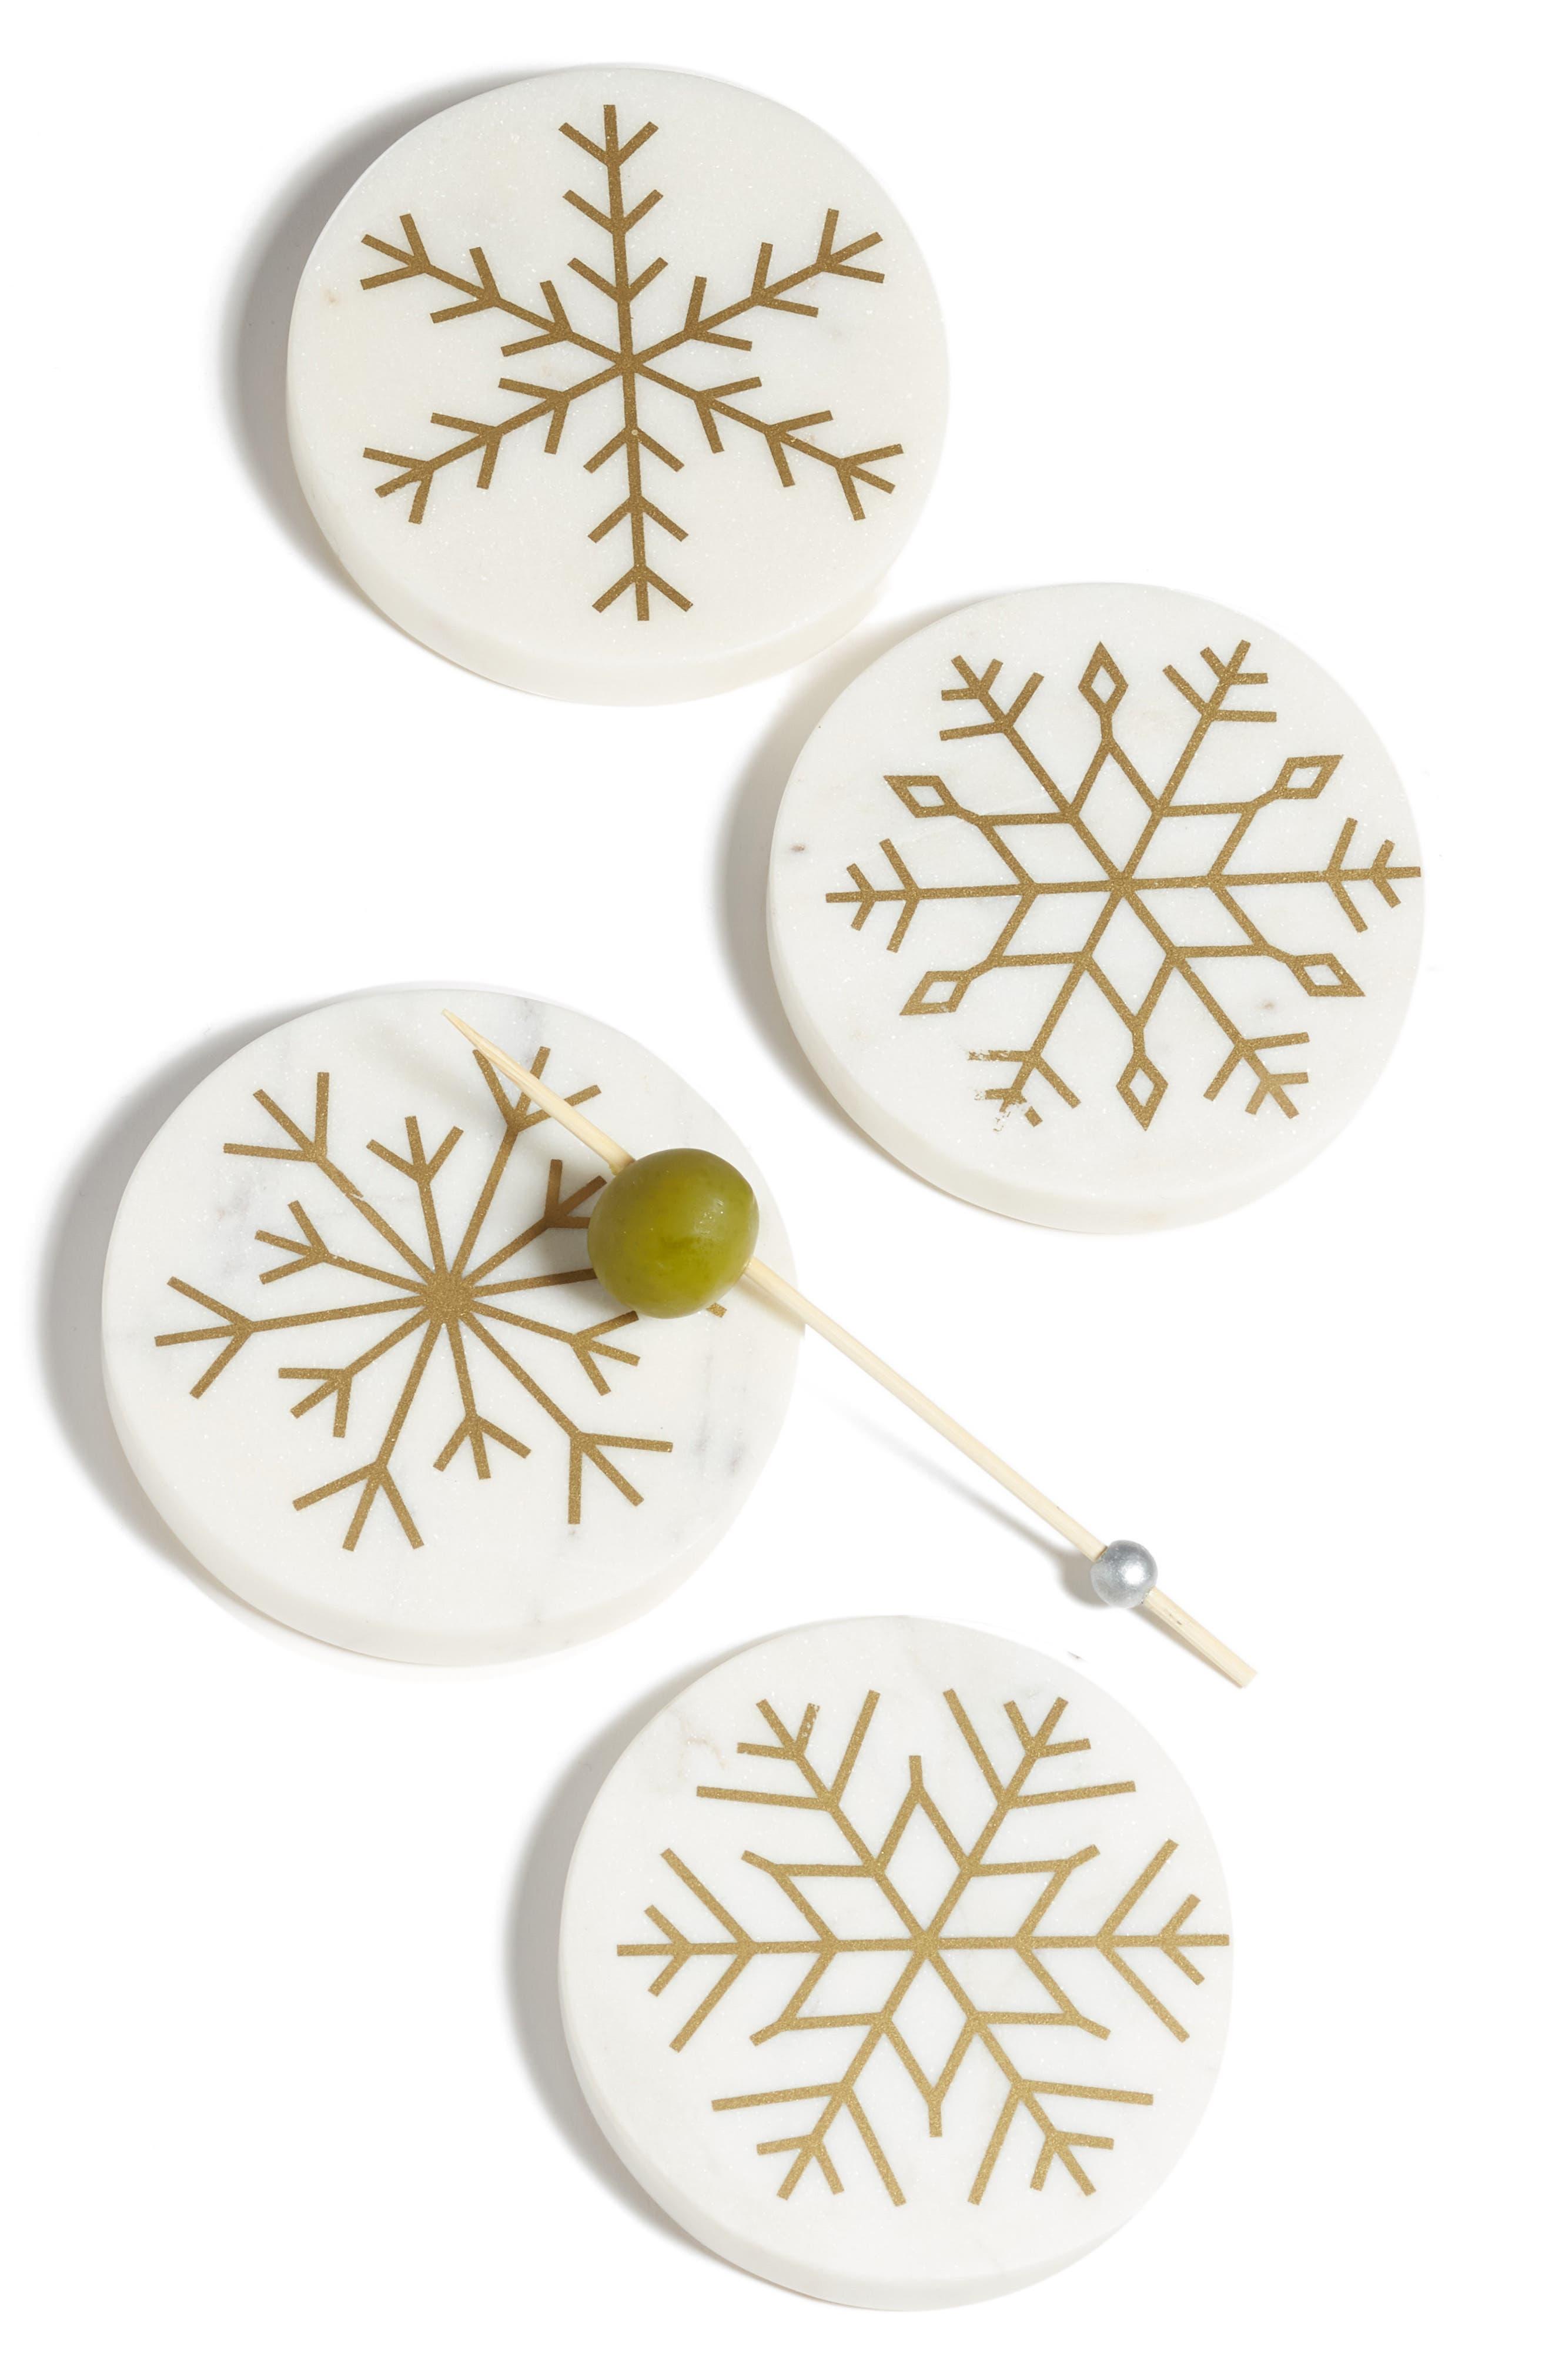 Snowflake Set of 4 Marble Coasters,                             Main thumbnail 1, color,                             100